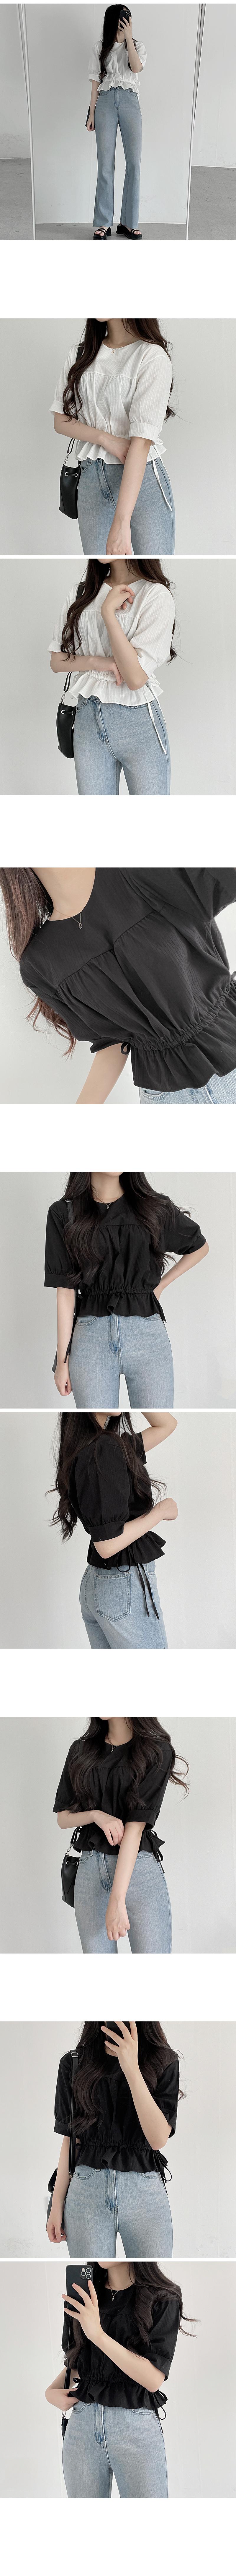 royce string blouse